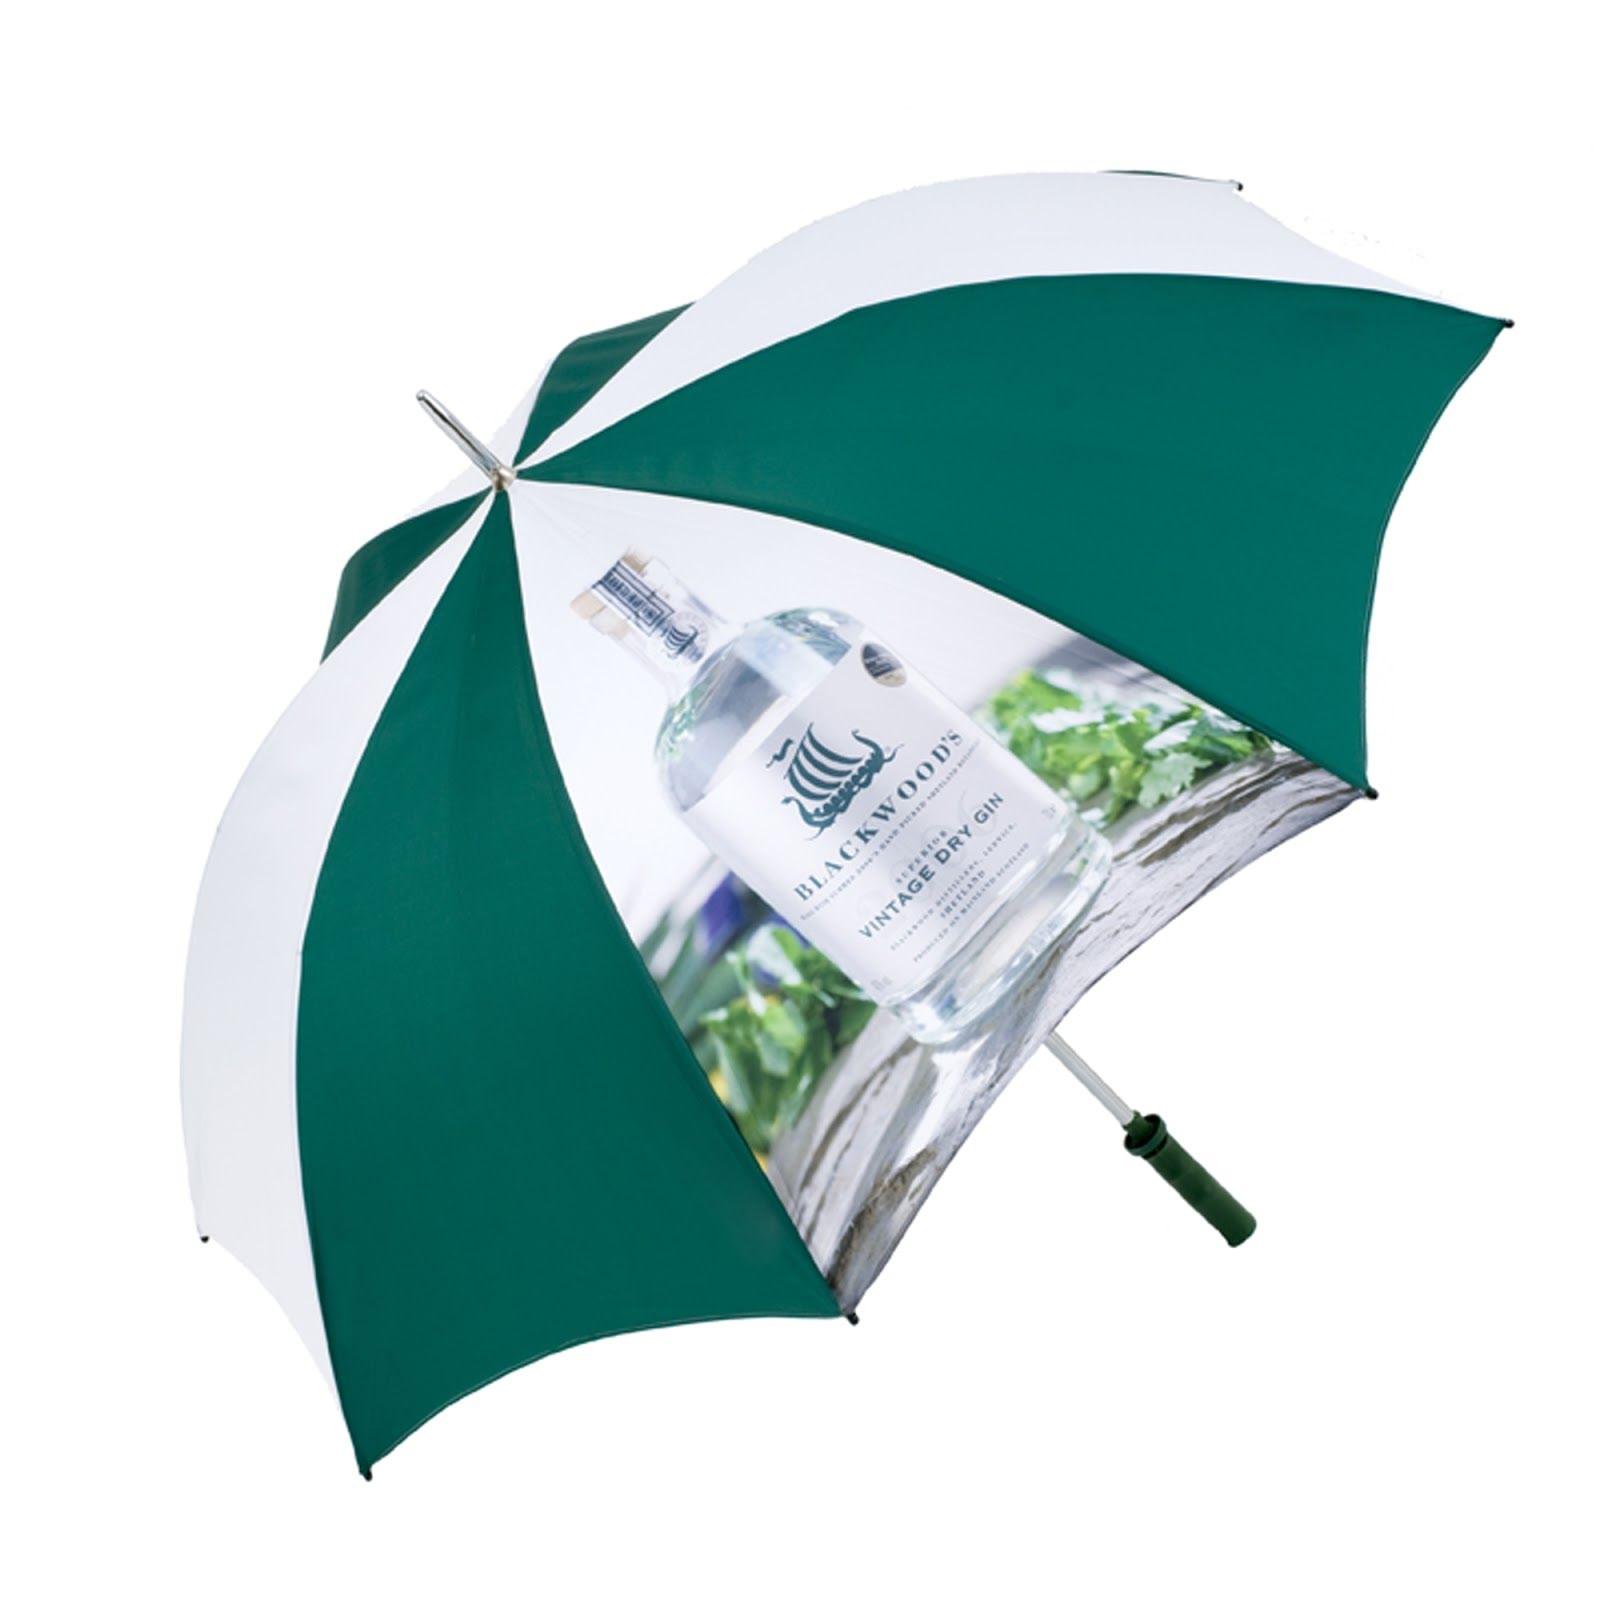 Promotional printed umbrellas green, white, yellow